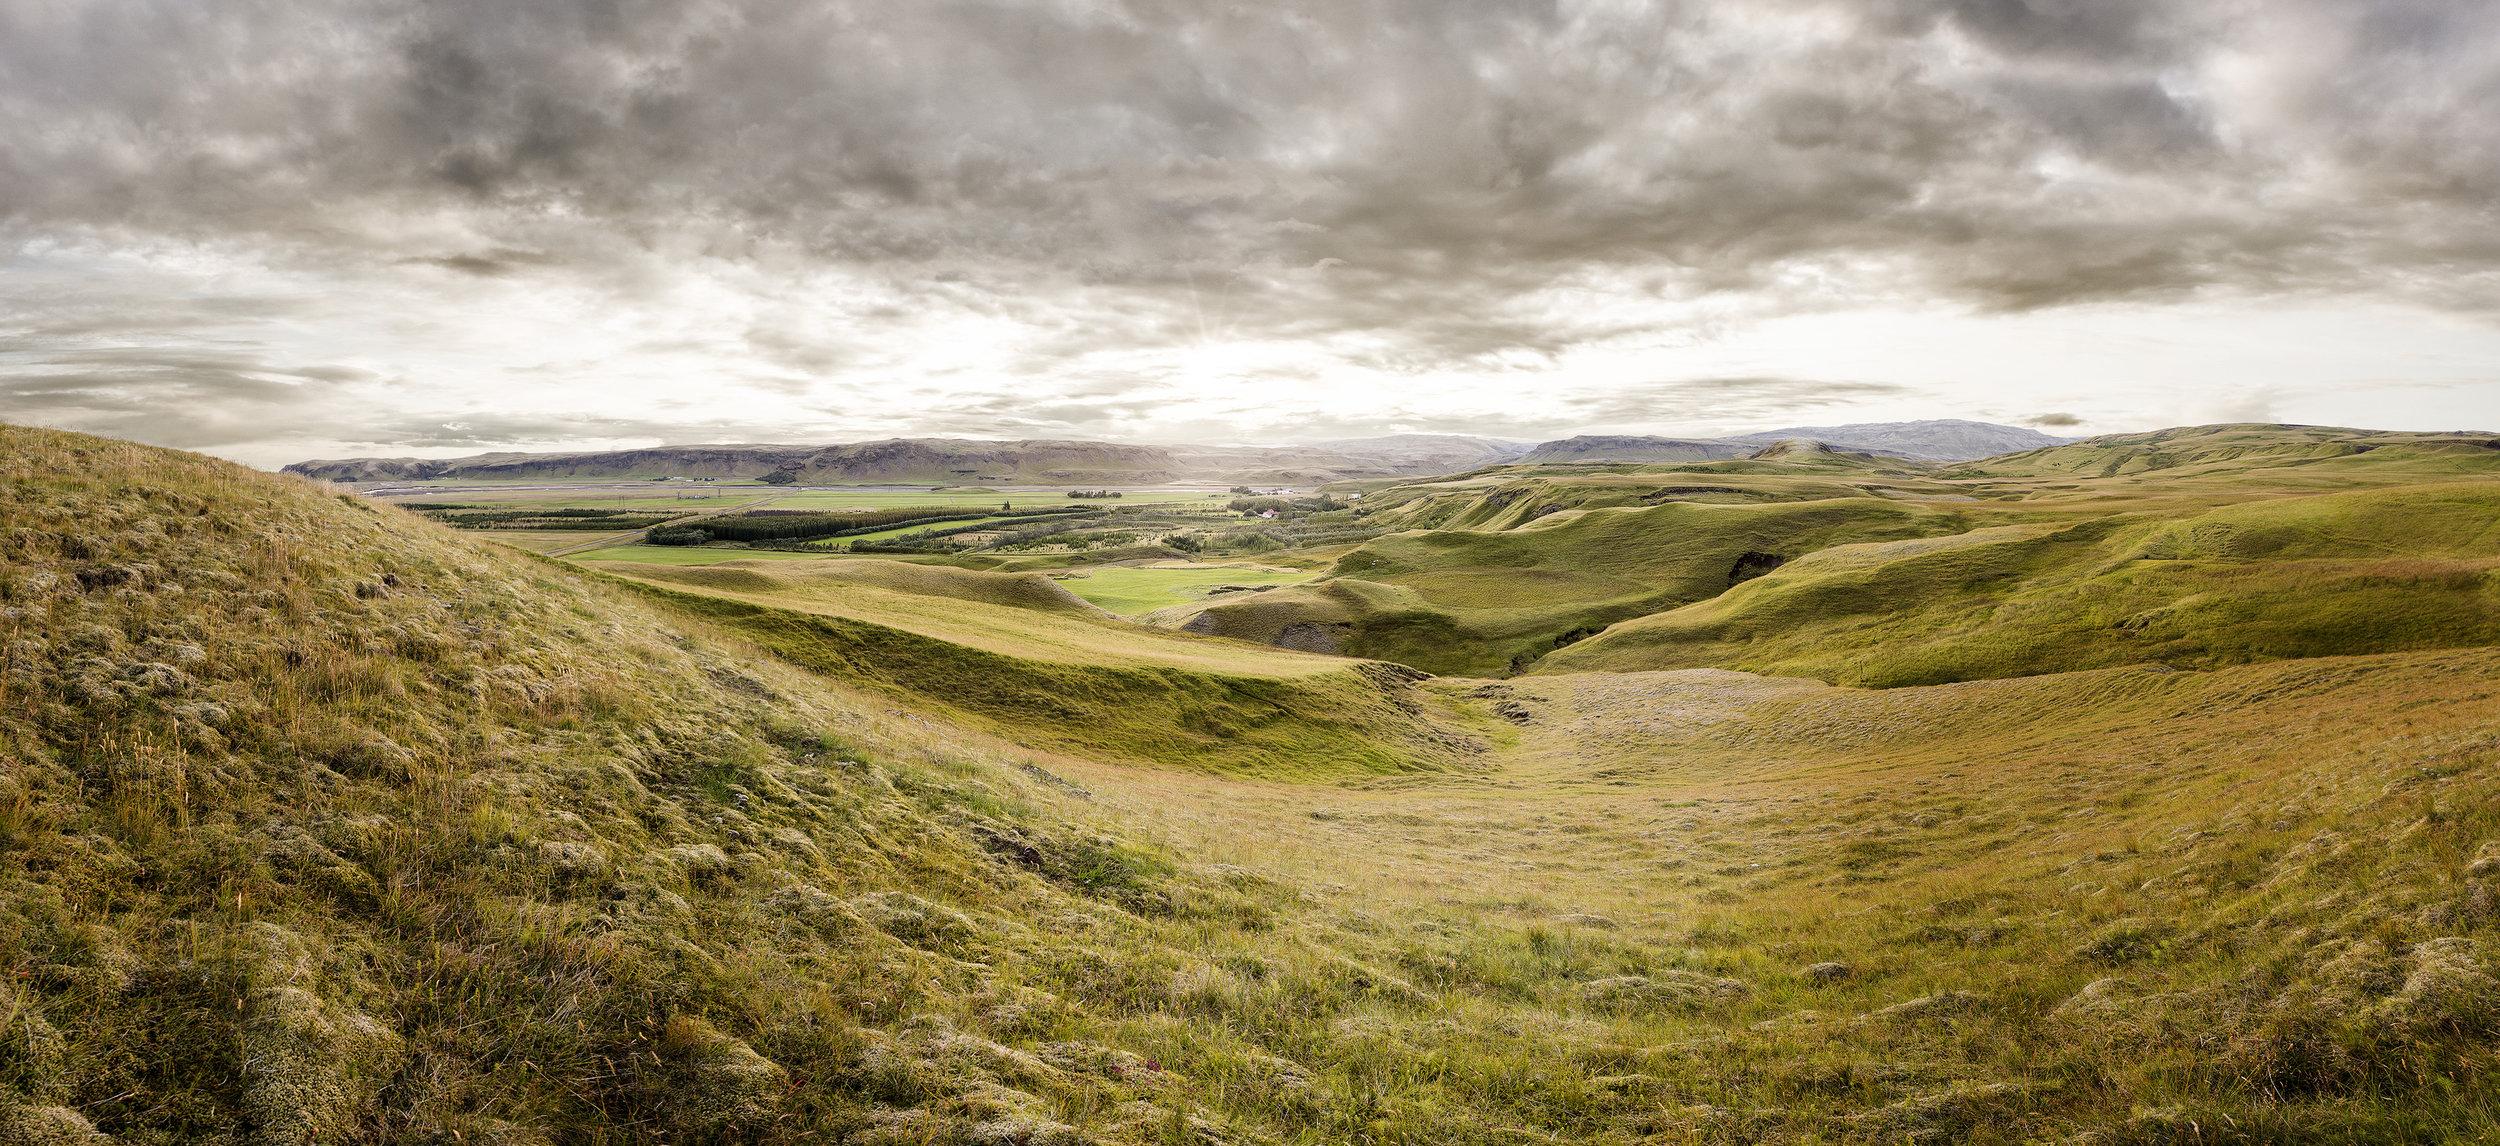 Iceland2018_Kirkjubæjarklaustur_A_small.jpg